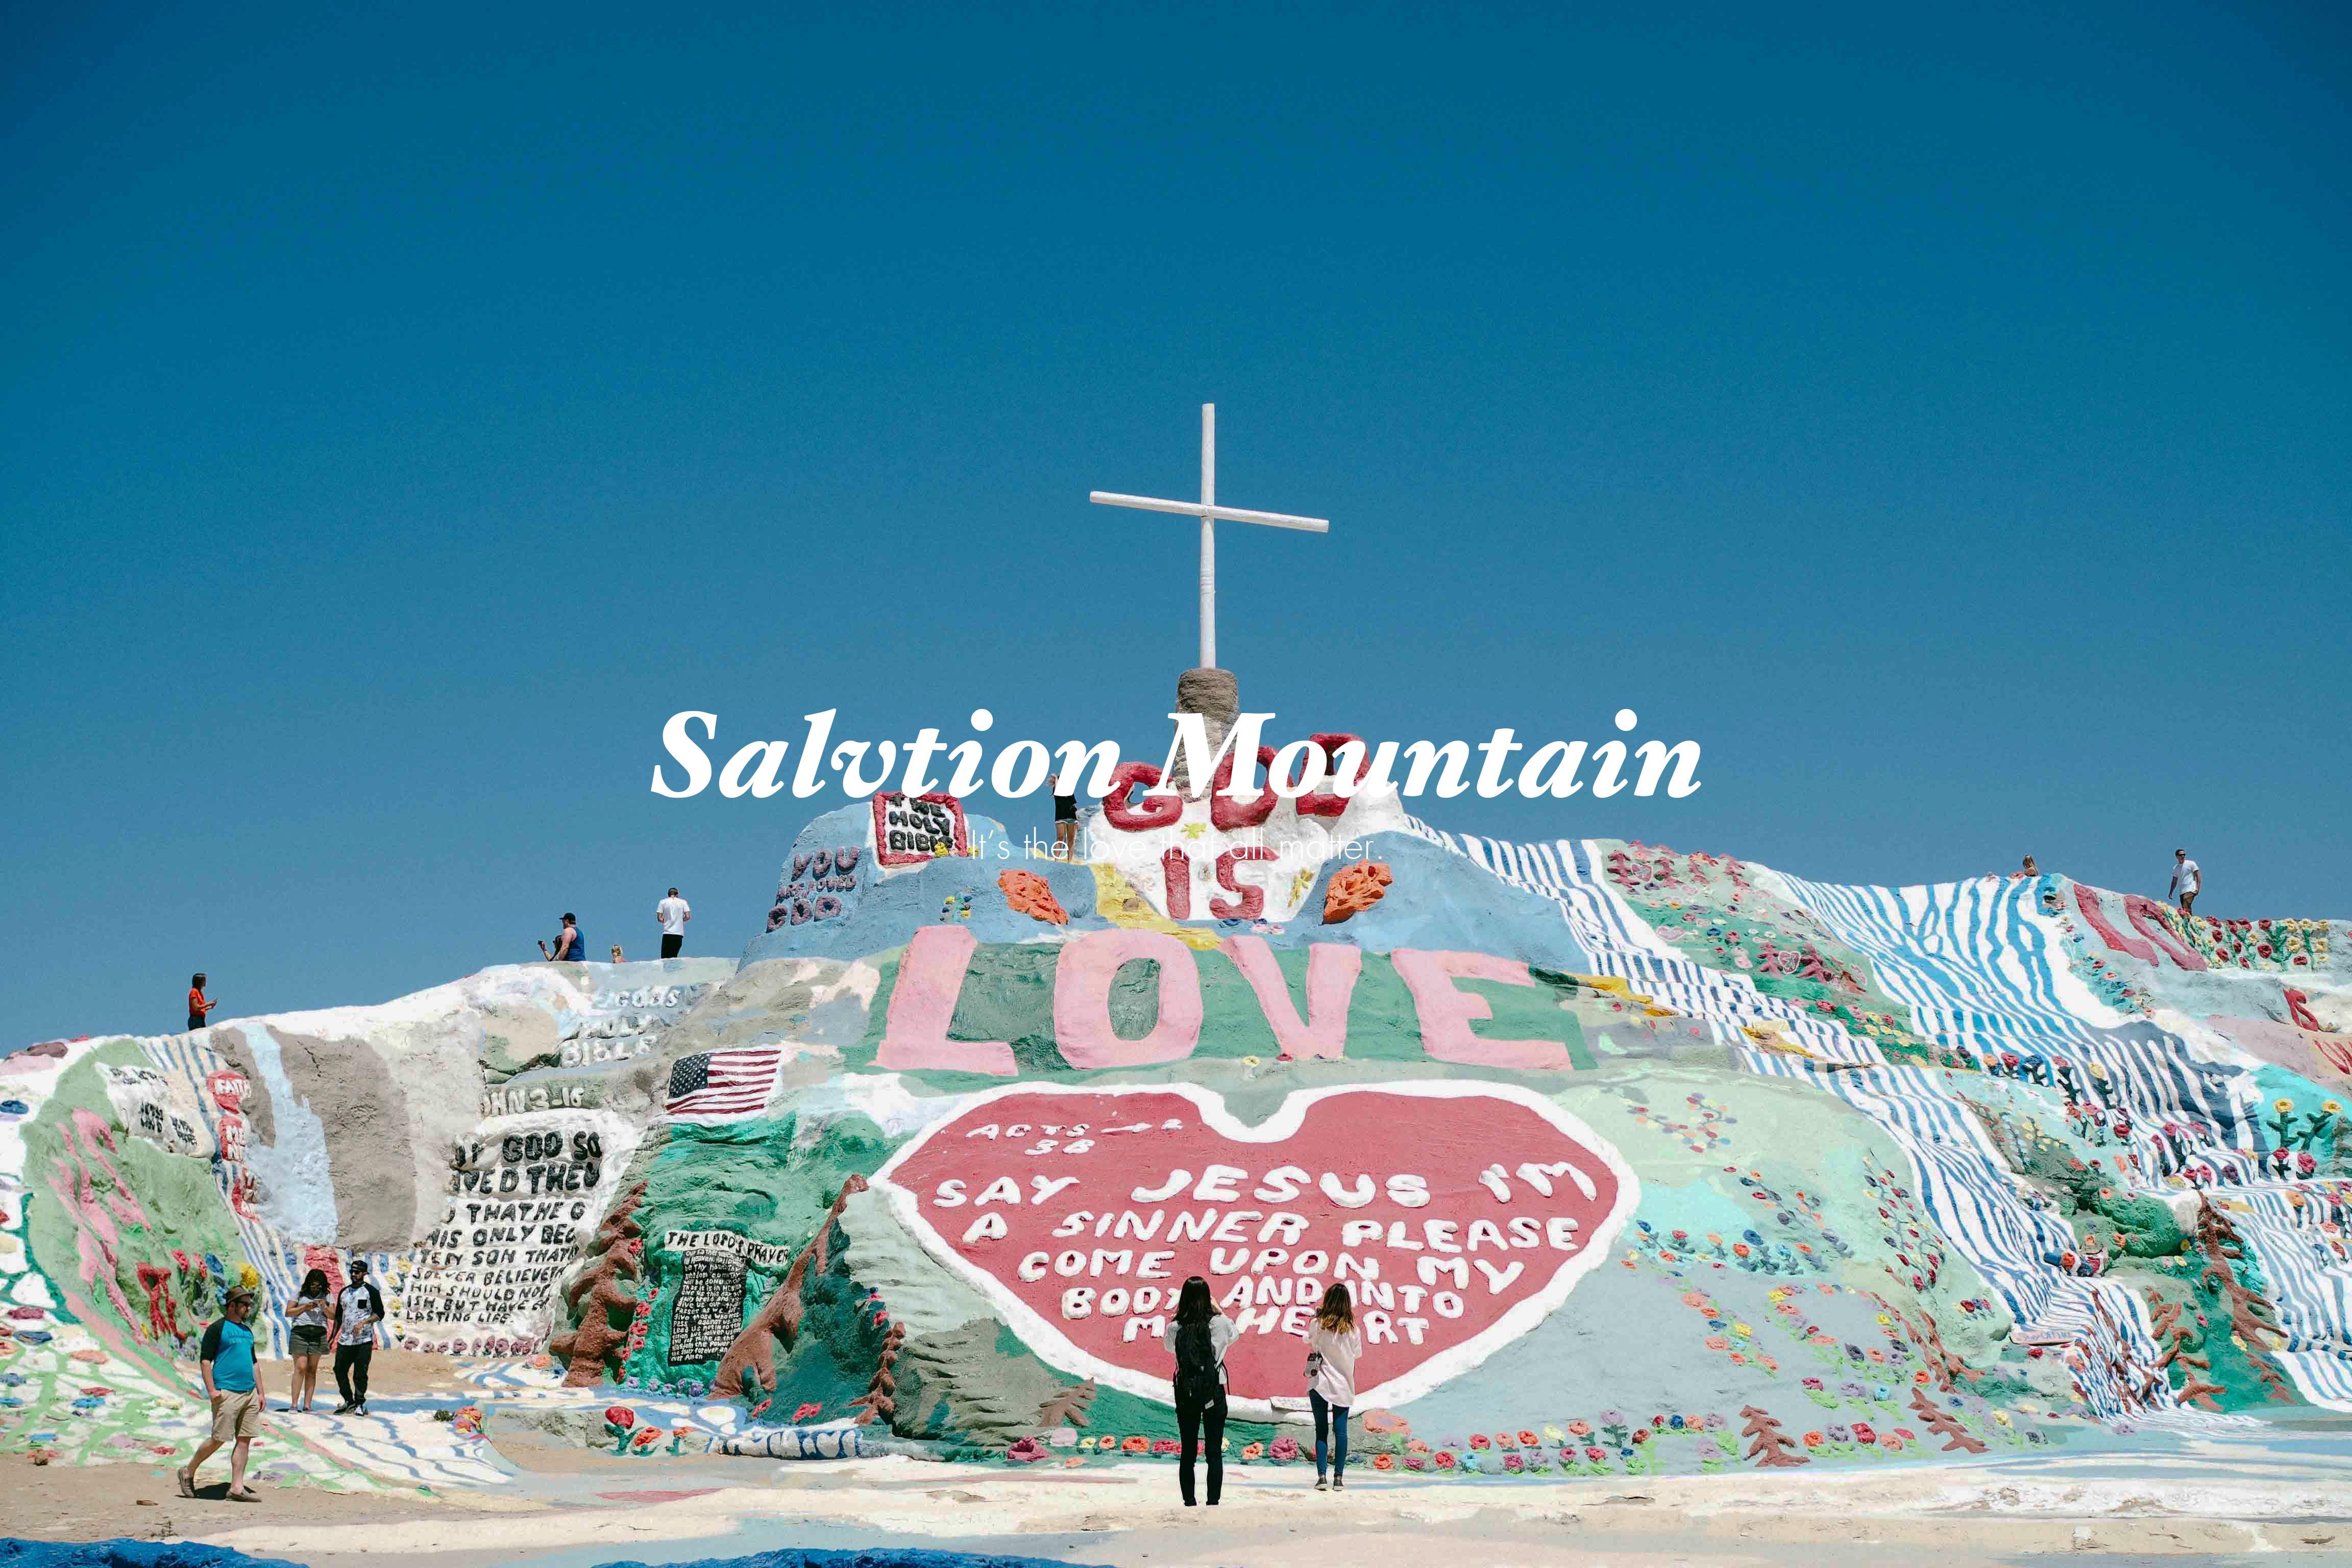 Salvation Mountain ภูเขาสีรุ้งแห่งความเชื่อและความฝัน